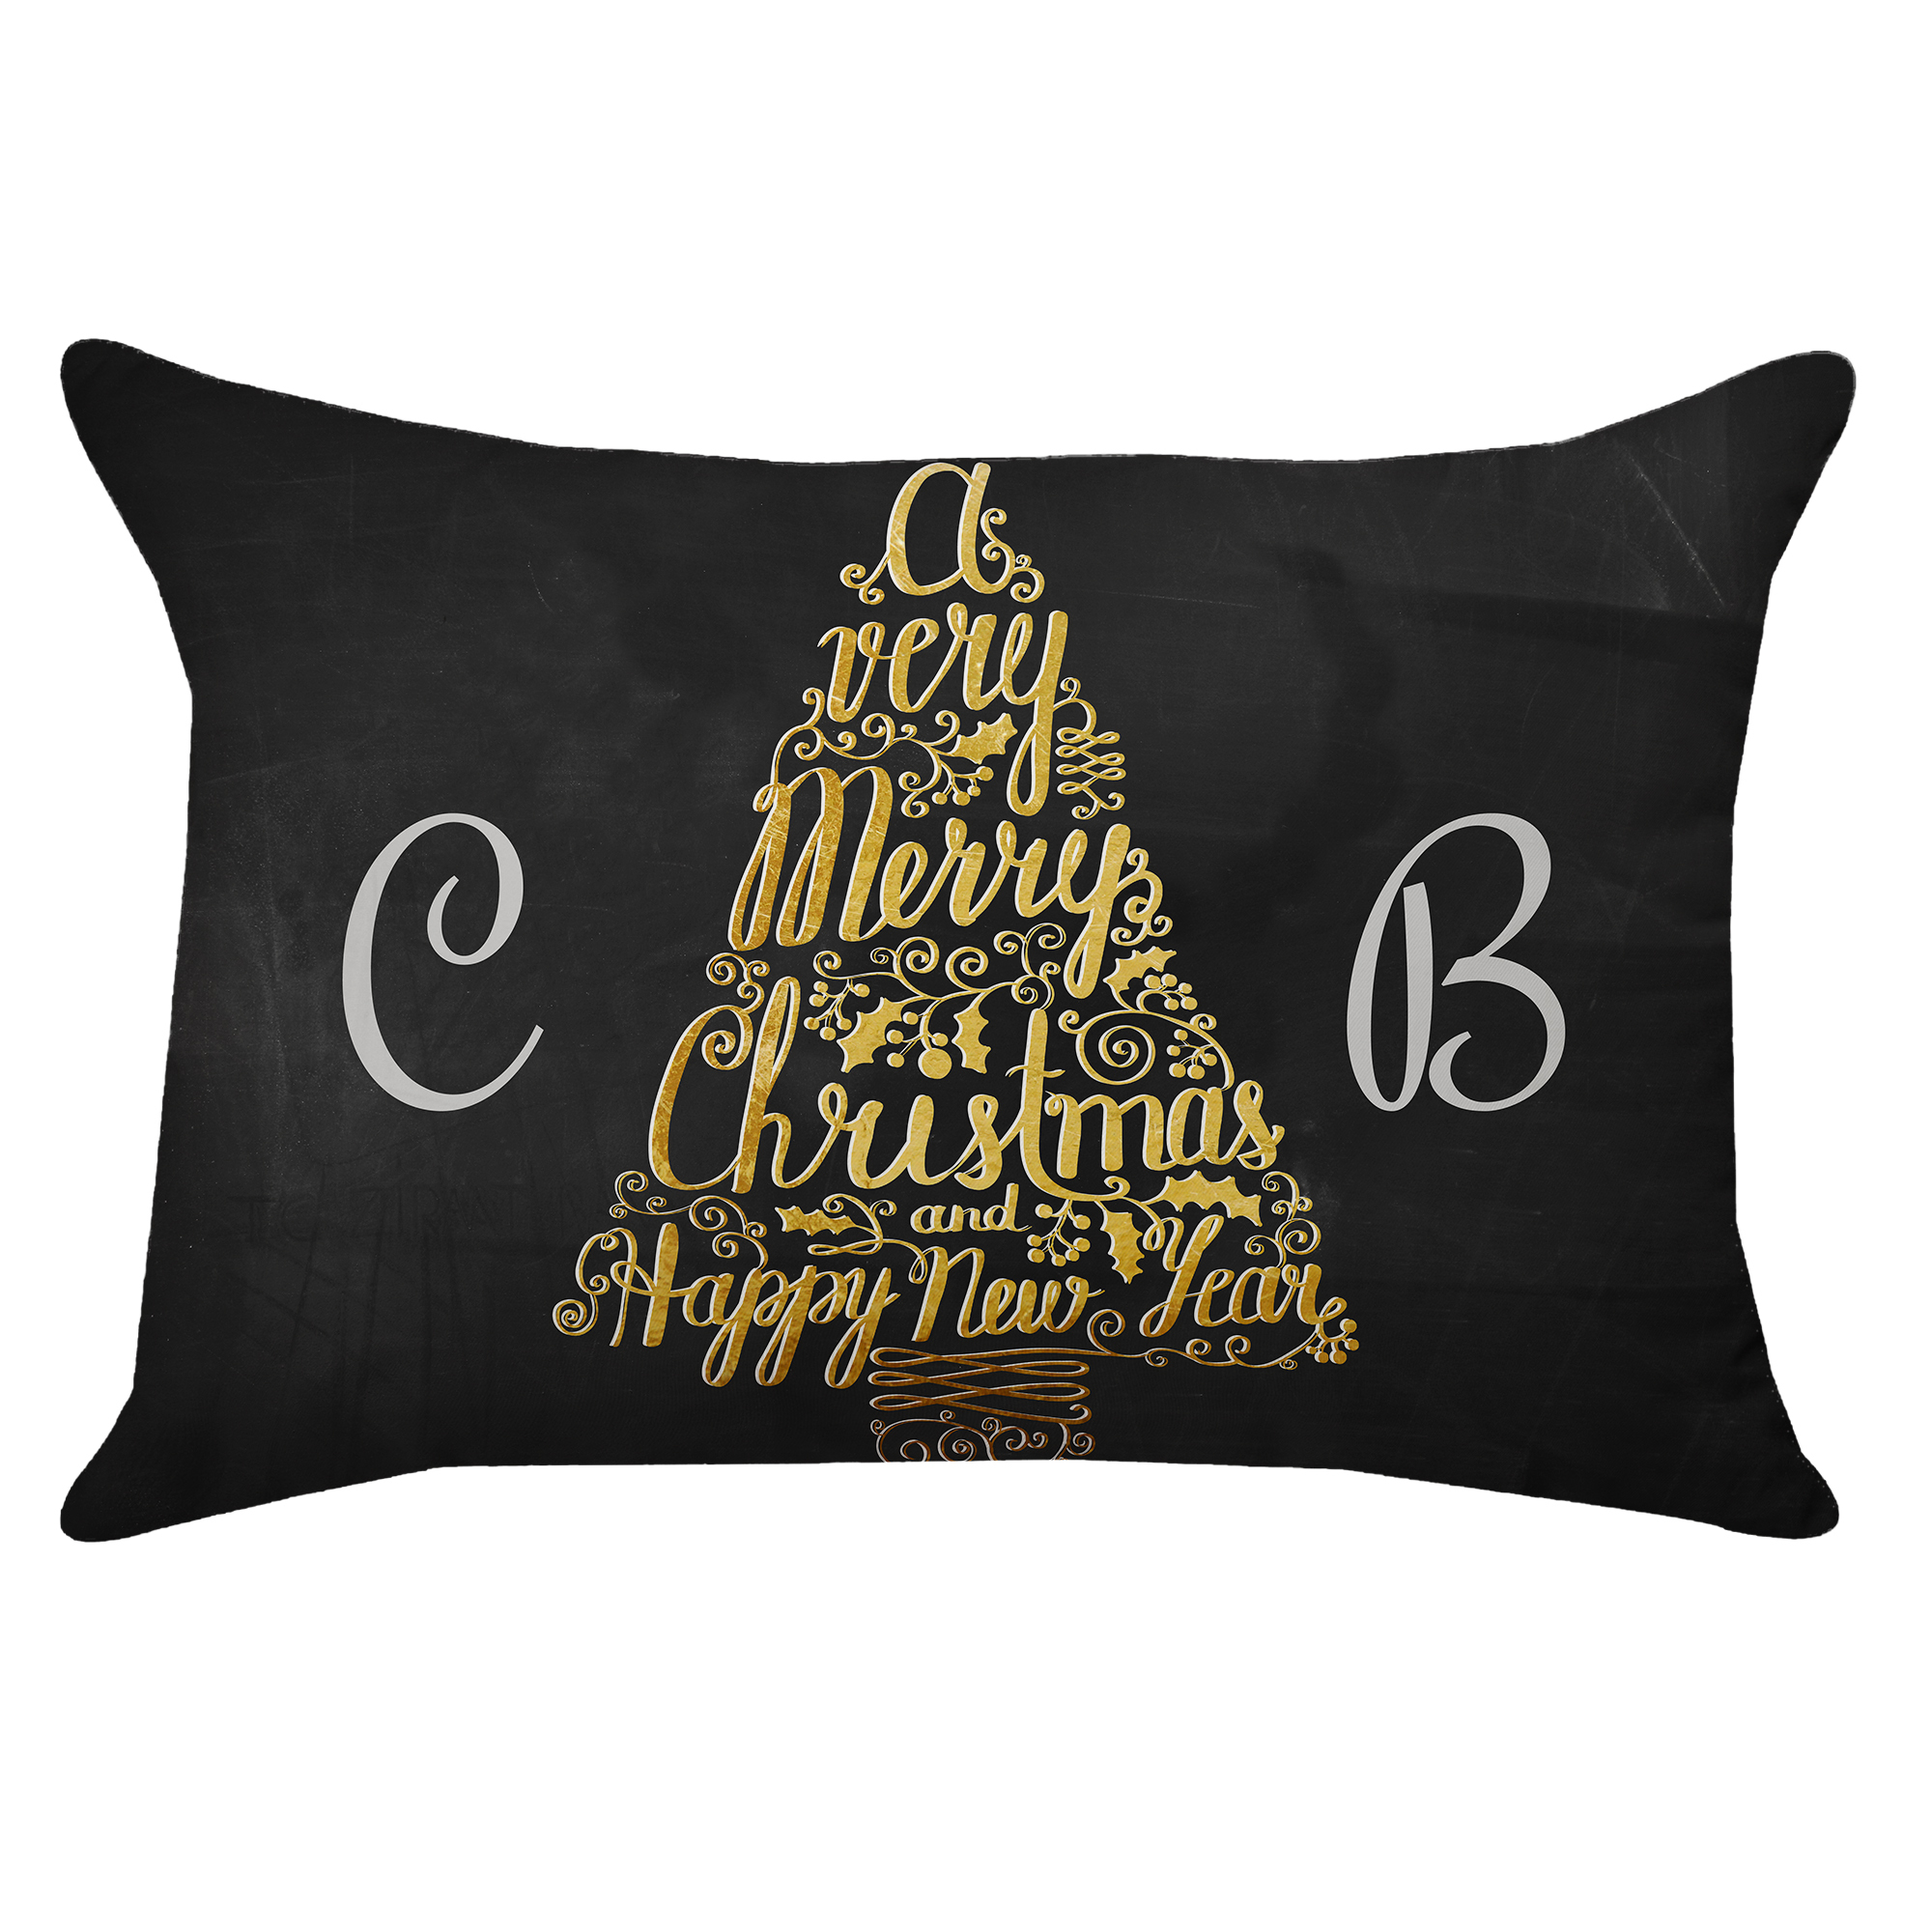 Personalized Metallic Tree Poplin Rectangular Throw Pillow in Black